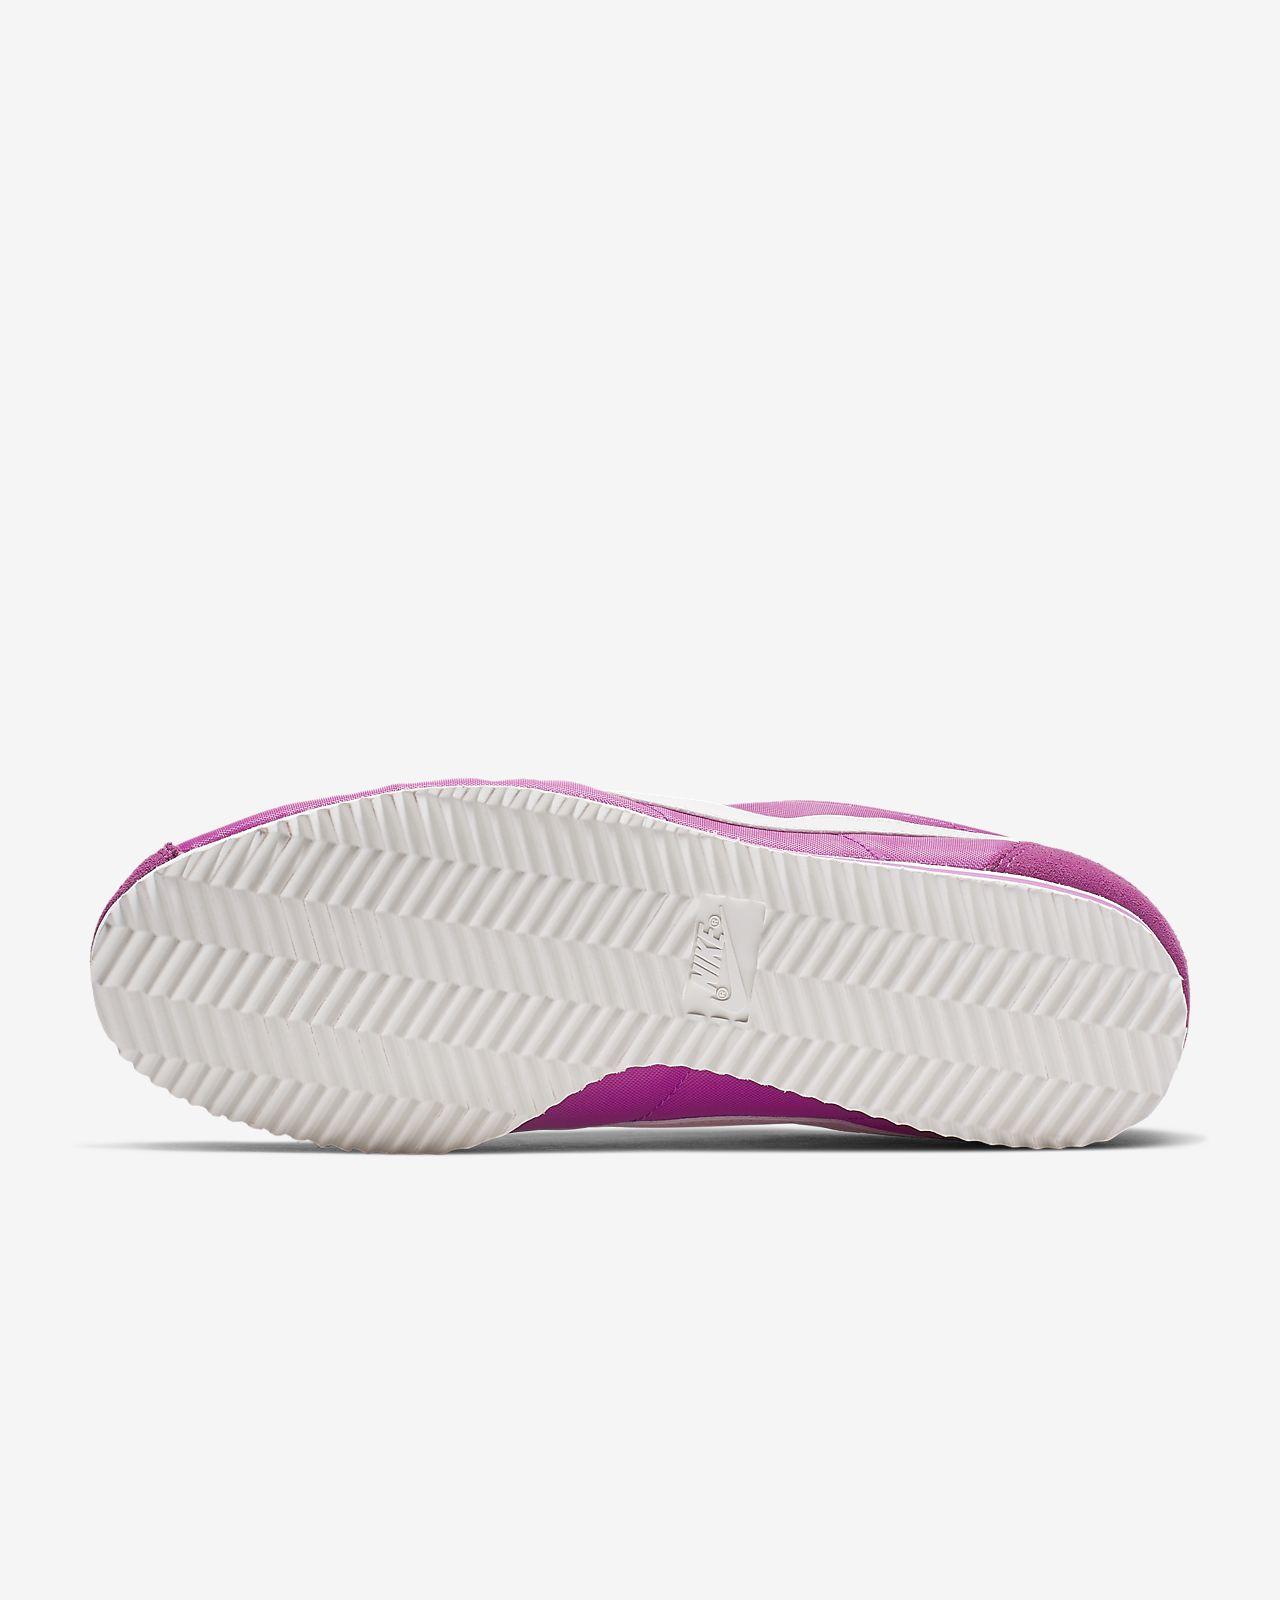 newest 531b7 a3b48 ... Nike Classic Cortez Nylon Women s Shoe